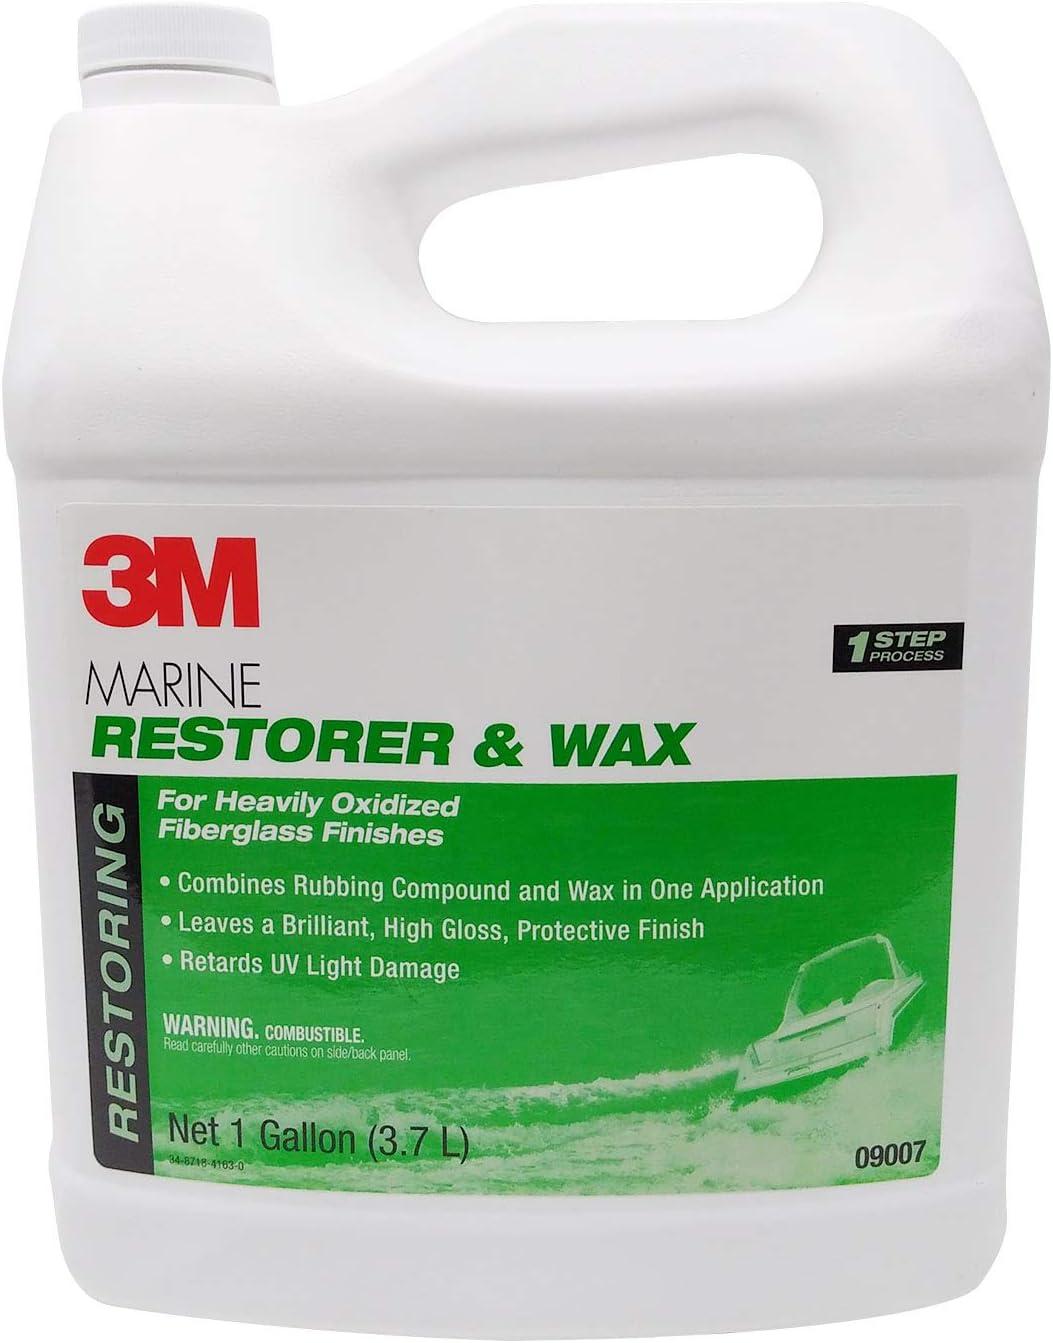 3M Marine Fiberglass Restorer & Wax Gallon